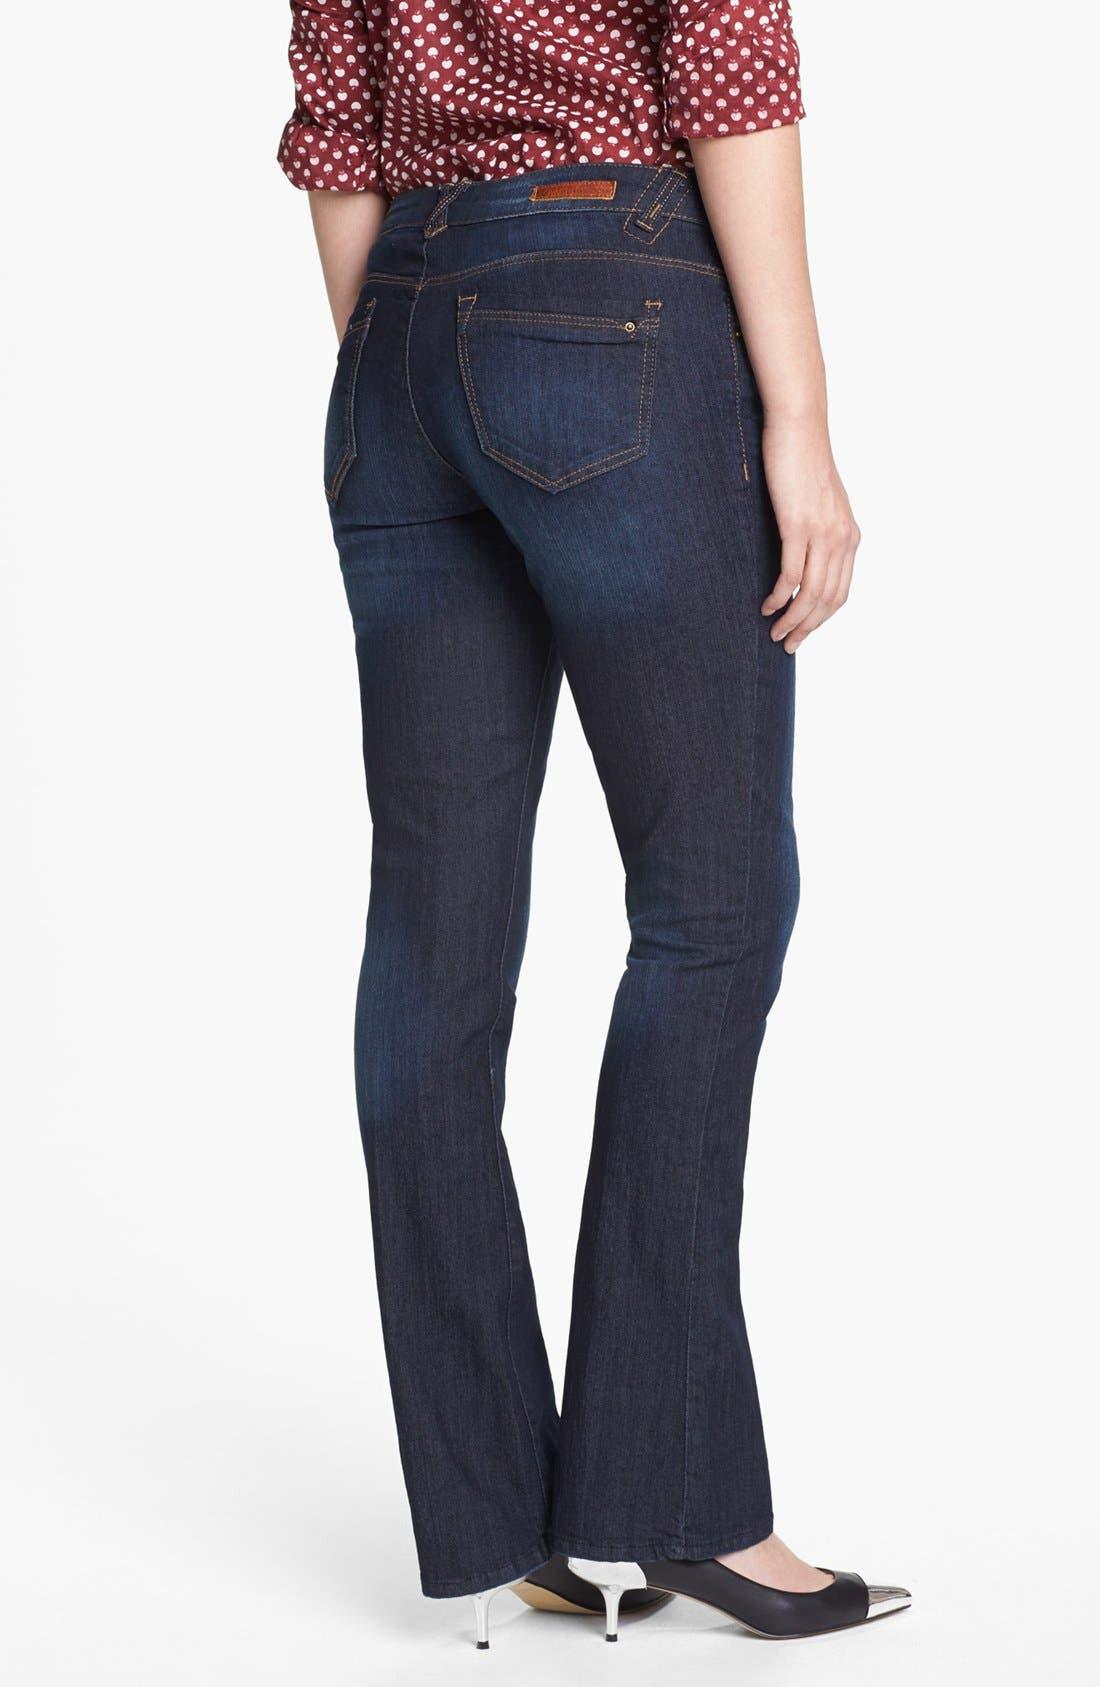 Alternate Image 2  - Wit & Wisdom 'Itty Bitty' Bootcut Jeans (Indigo) (Nordstrom Exclusive)